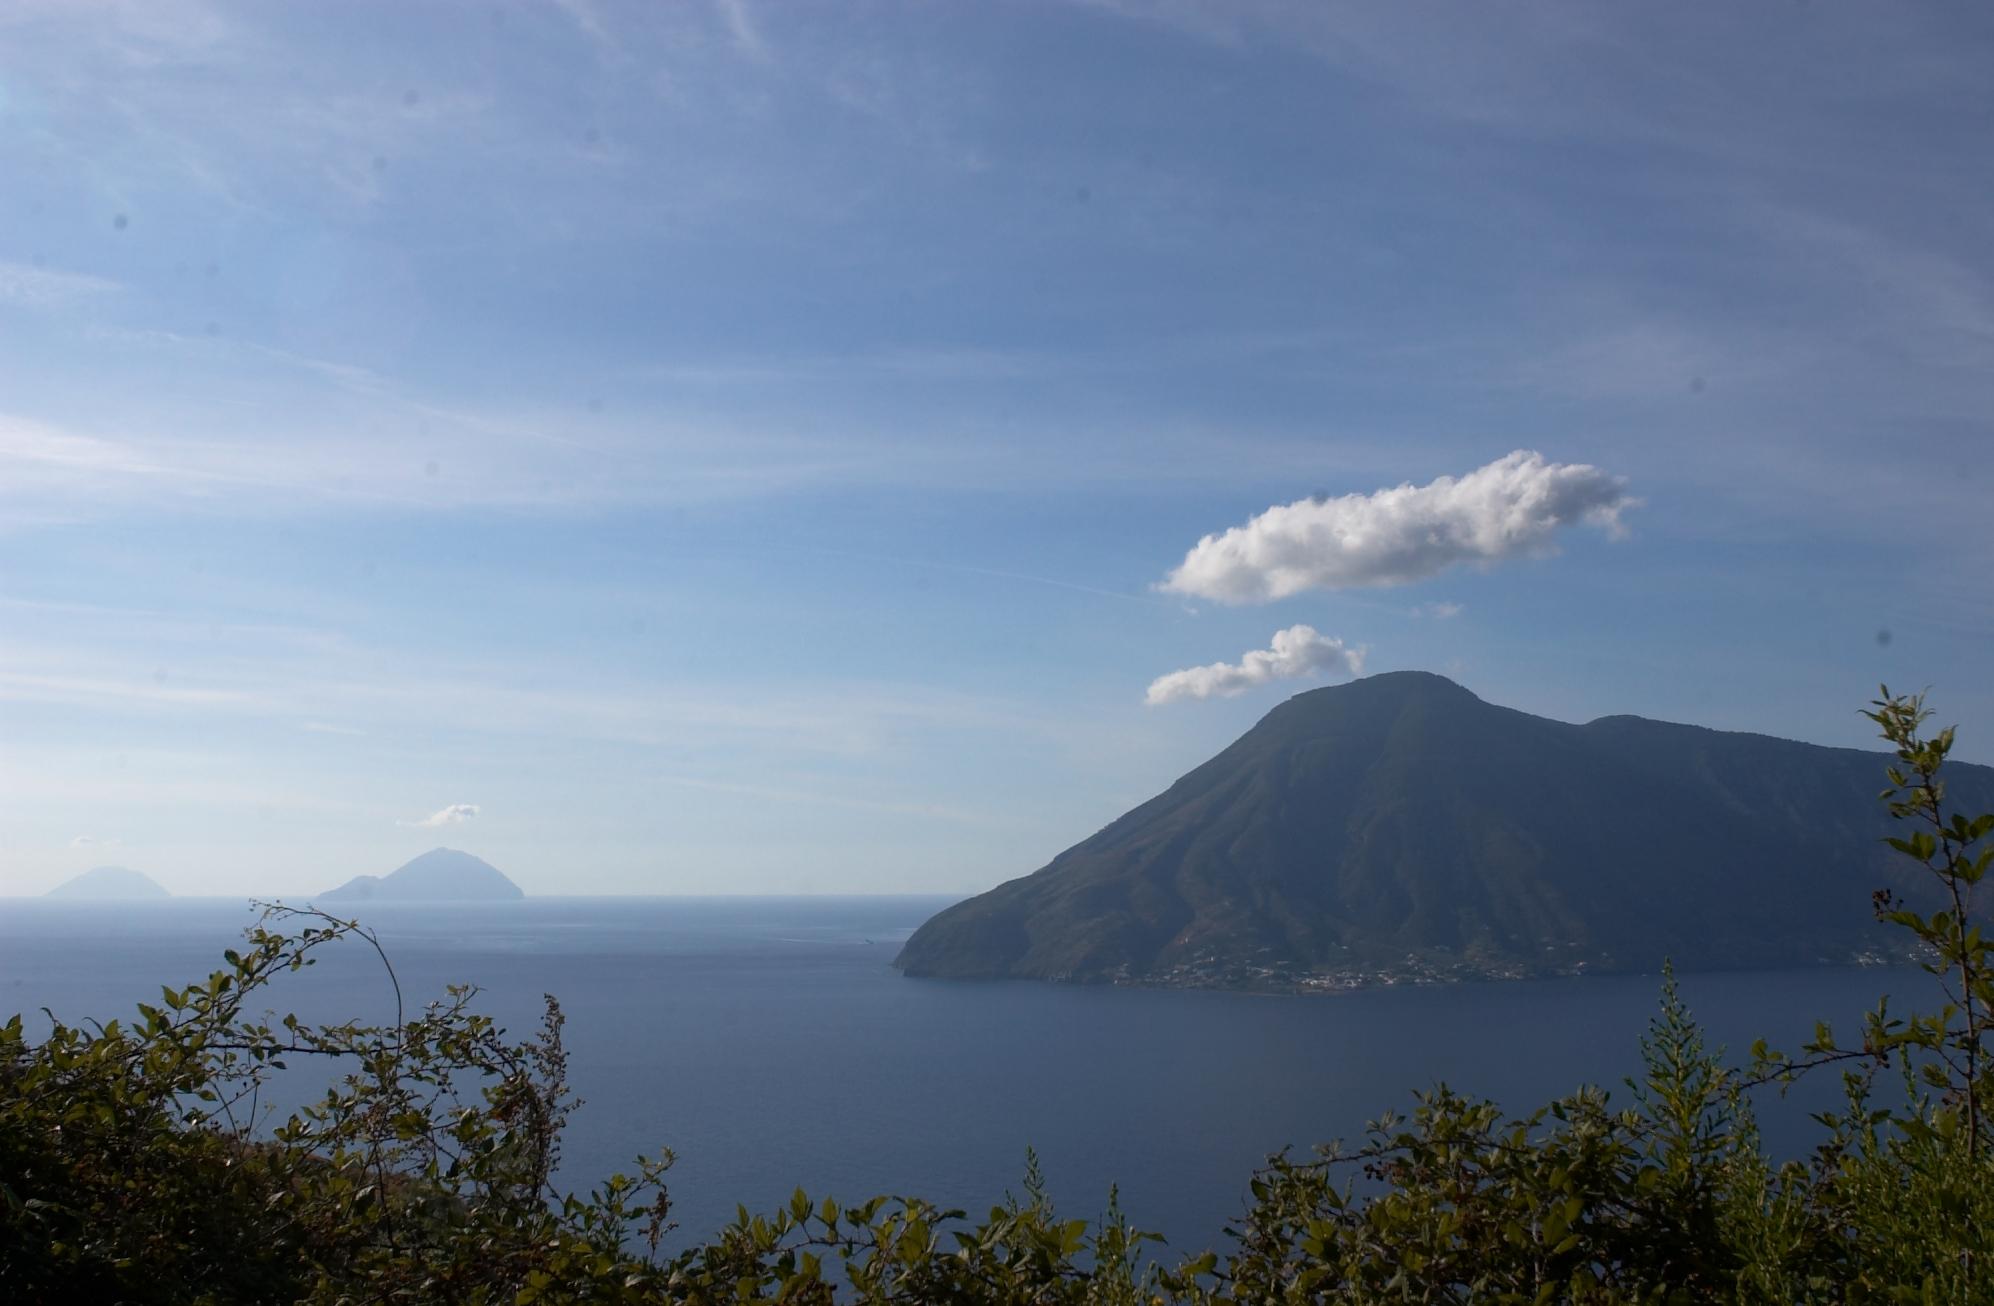 Salina Island, as seen from Lipari. Filicudi and Alicudi islands in the background. (Aeolian Islands)